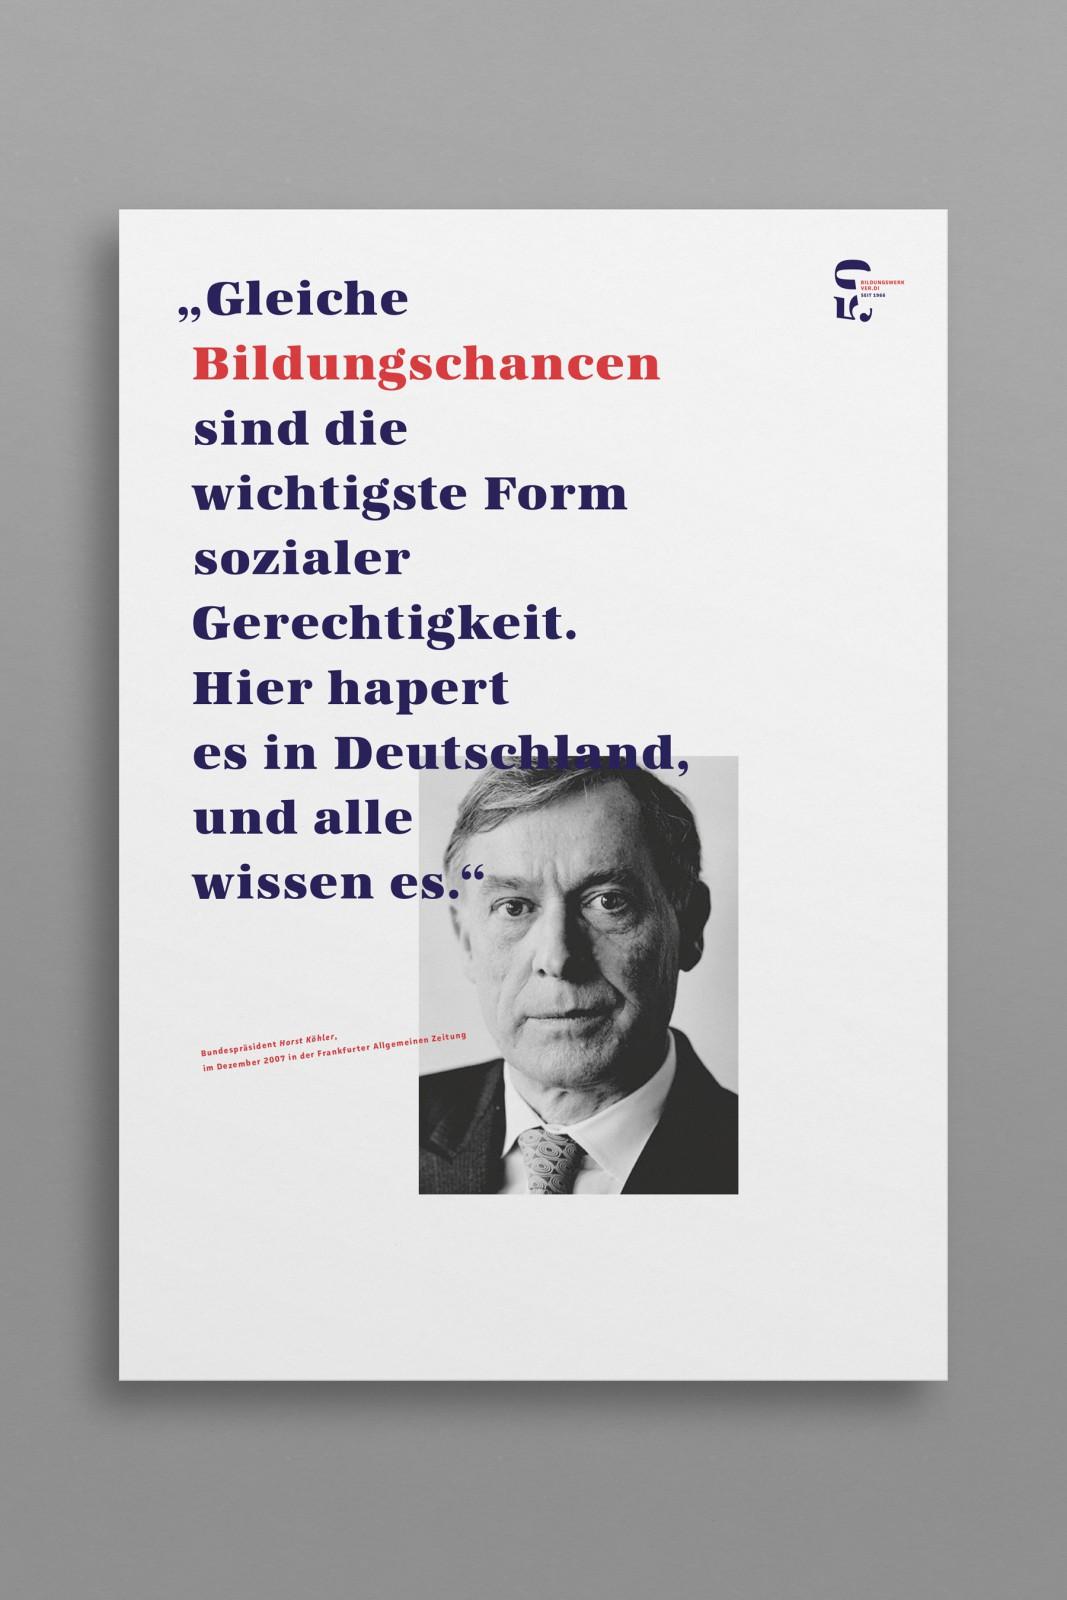 50th anniversary of the Bildungswerk in Niedersachsen